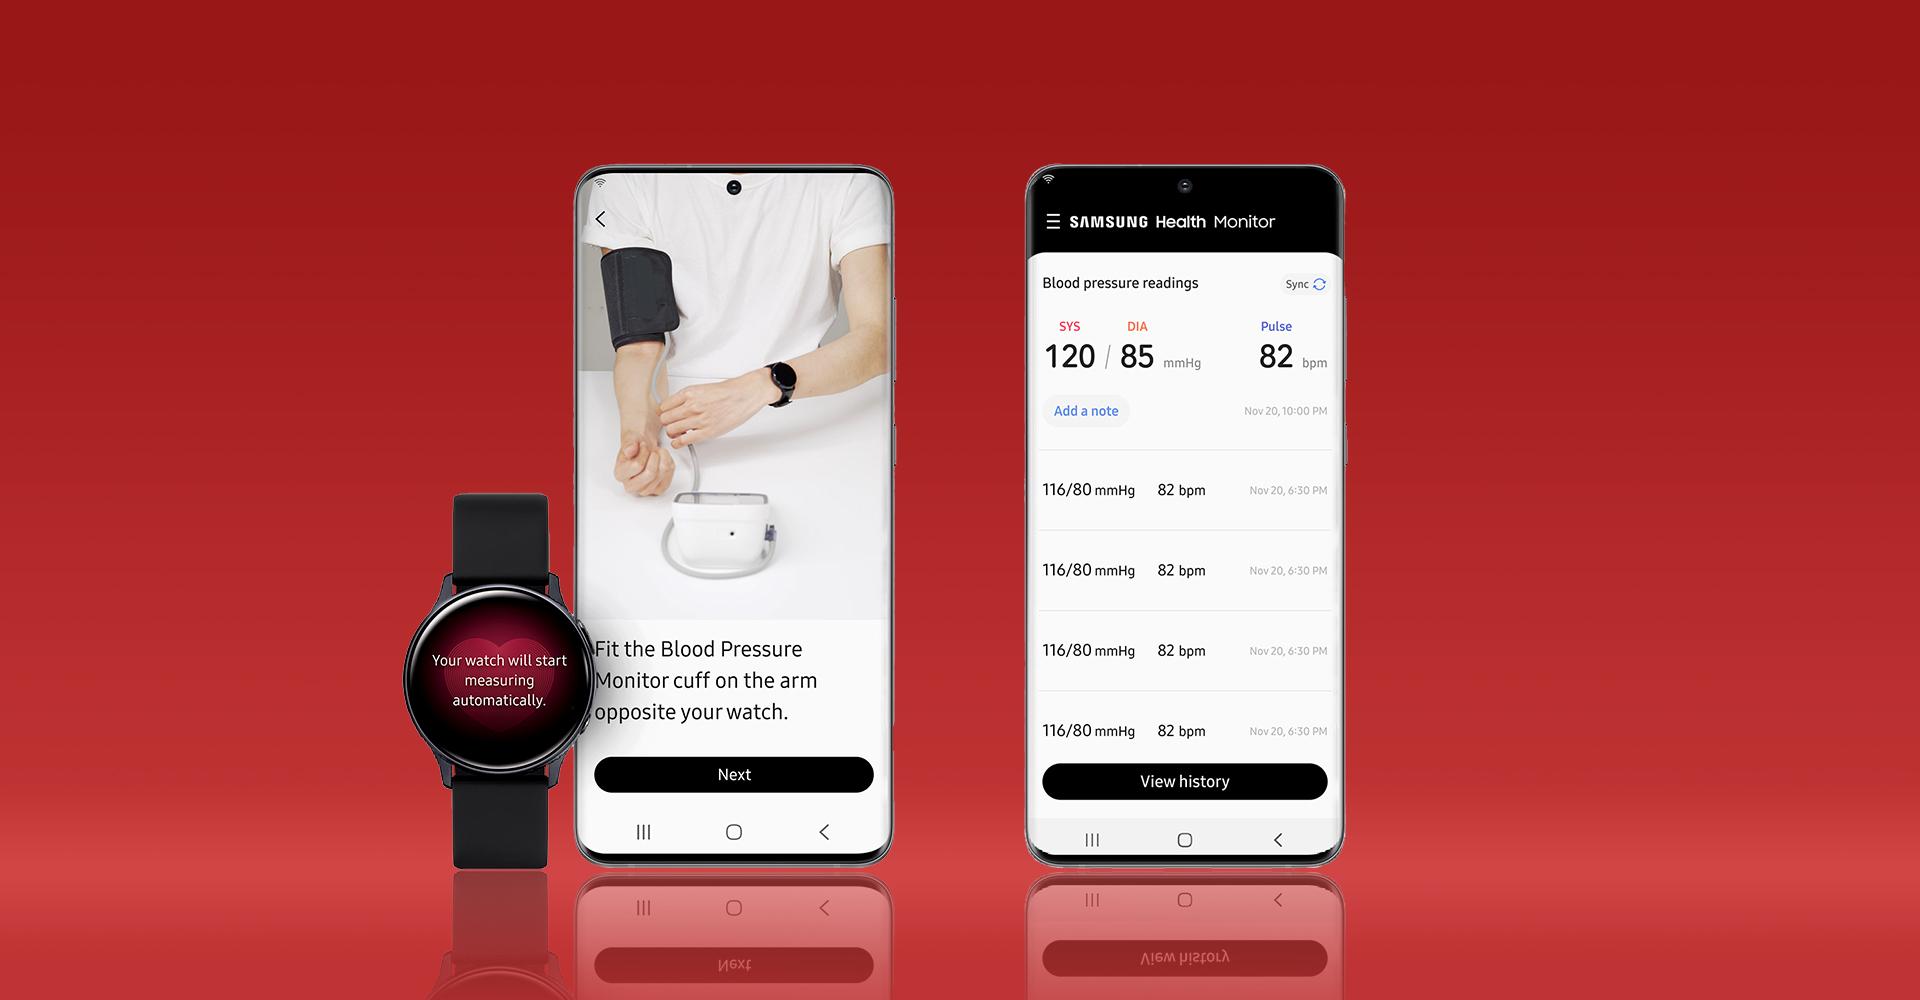 Galaxy Watch Active 2 Samsung Health Monitor App